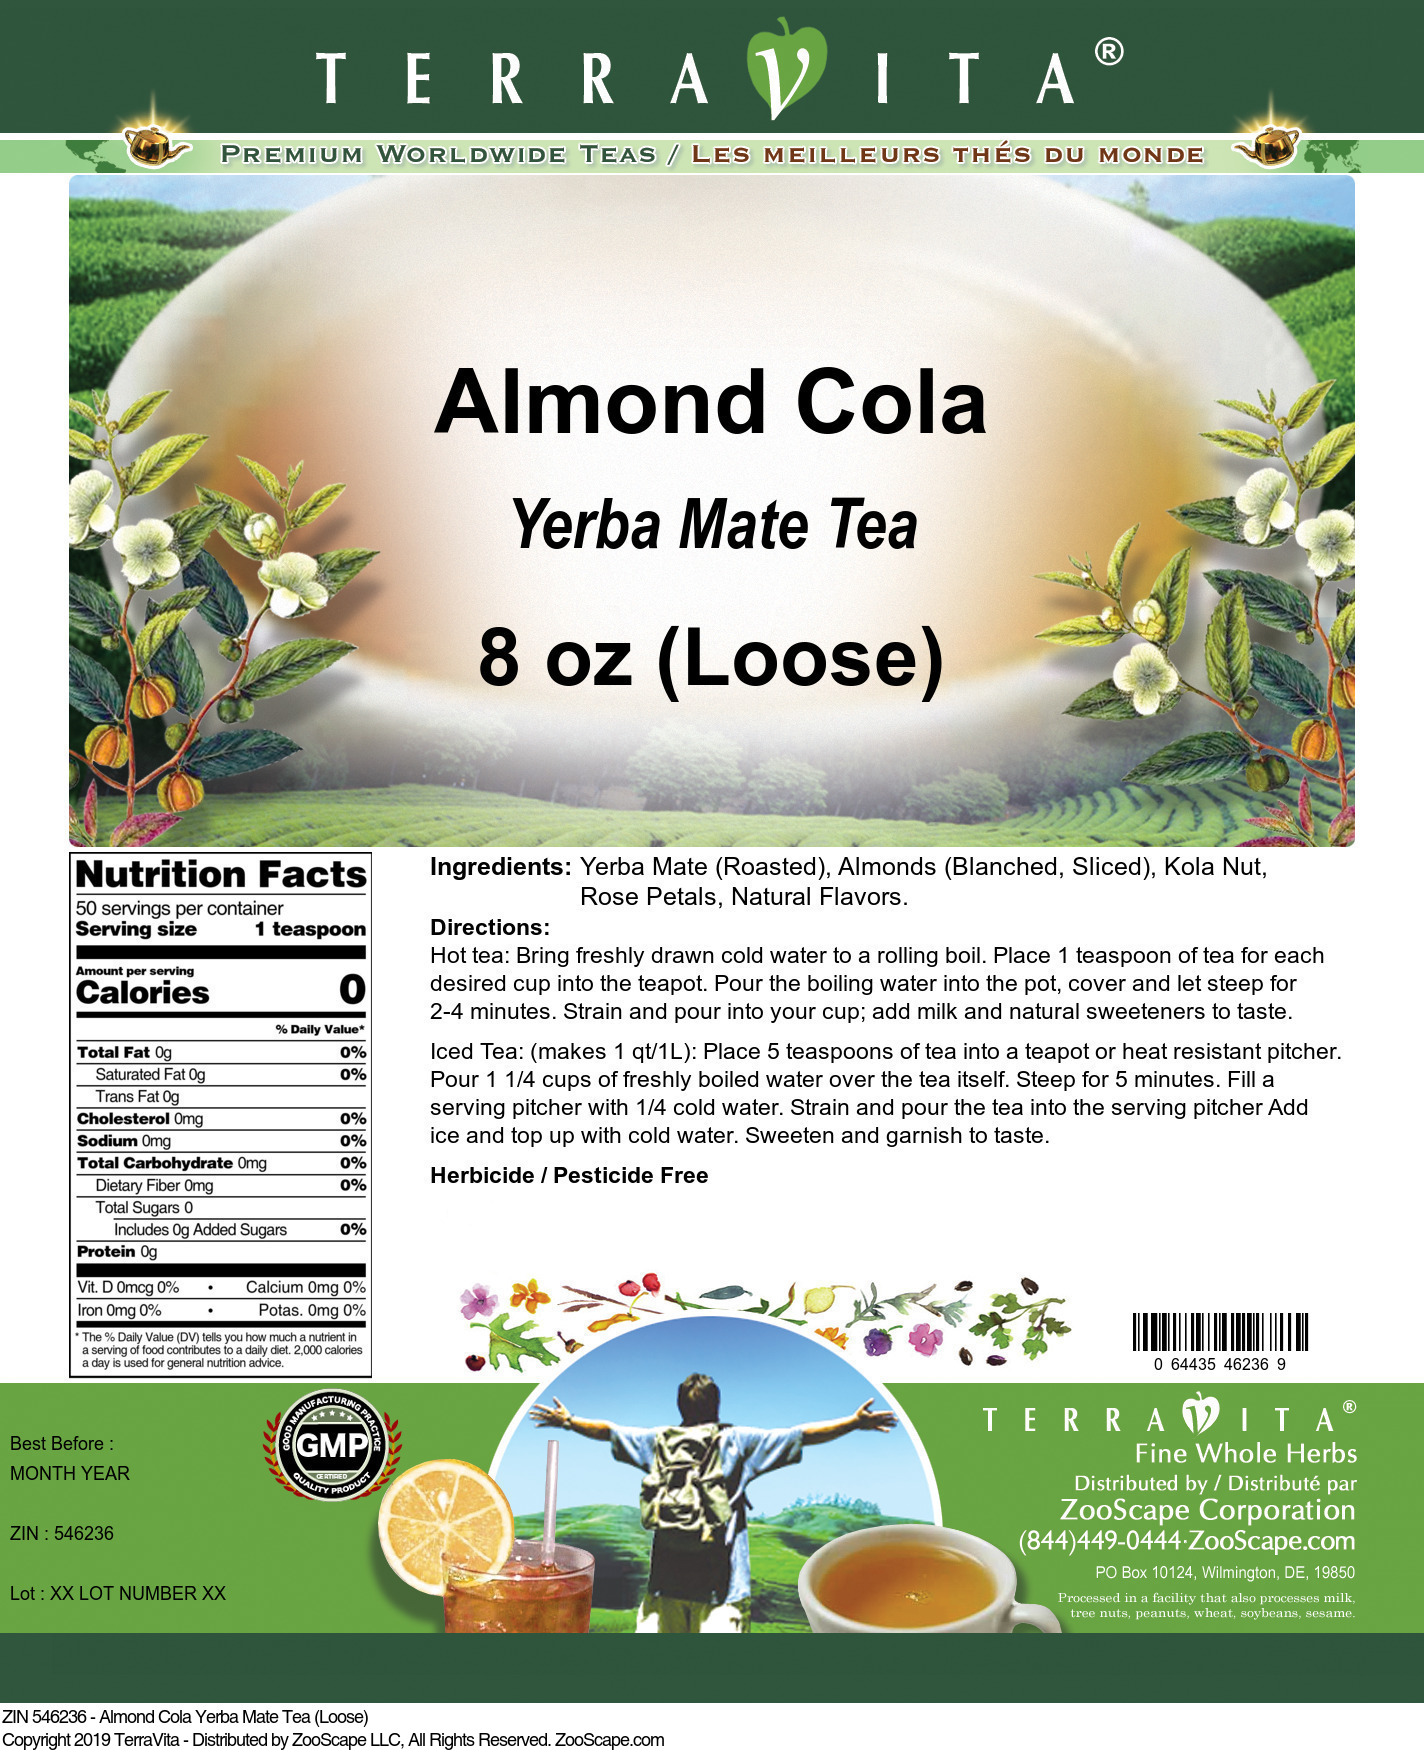 Almond Cola Yerba Mate